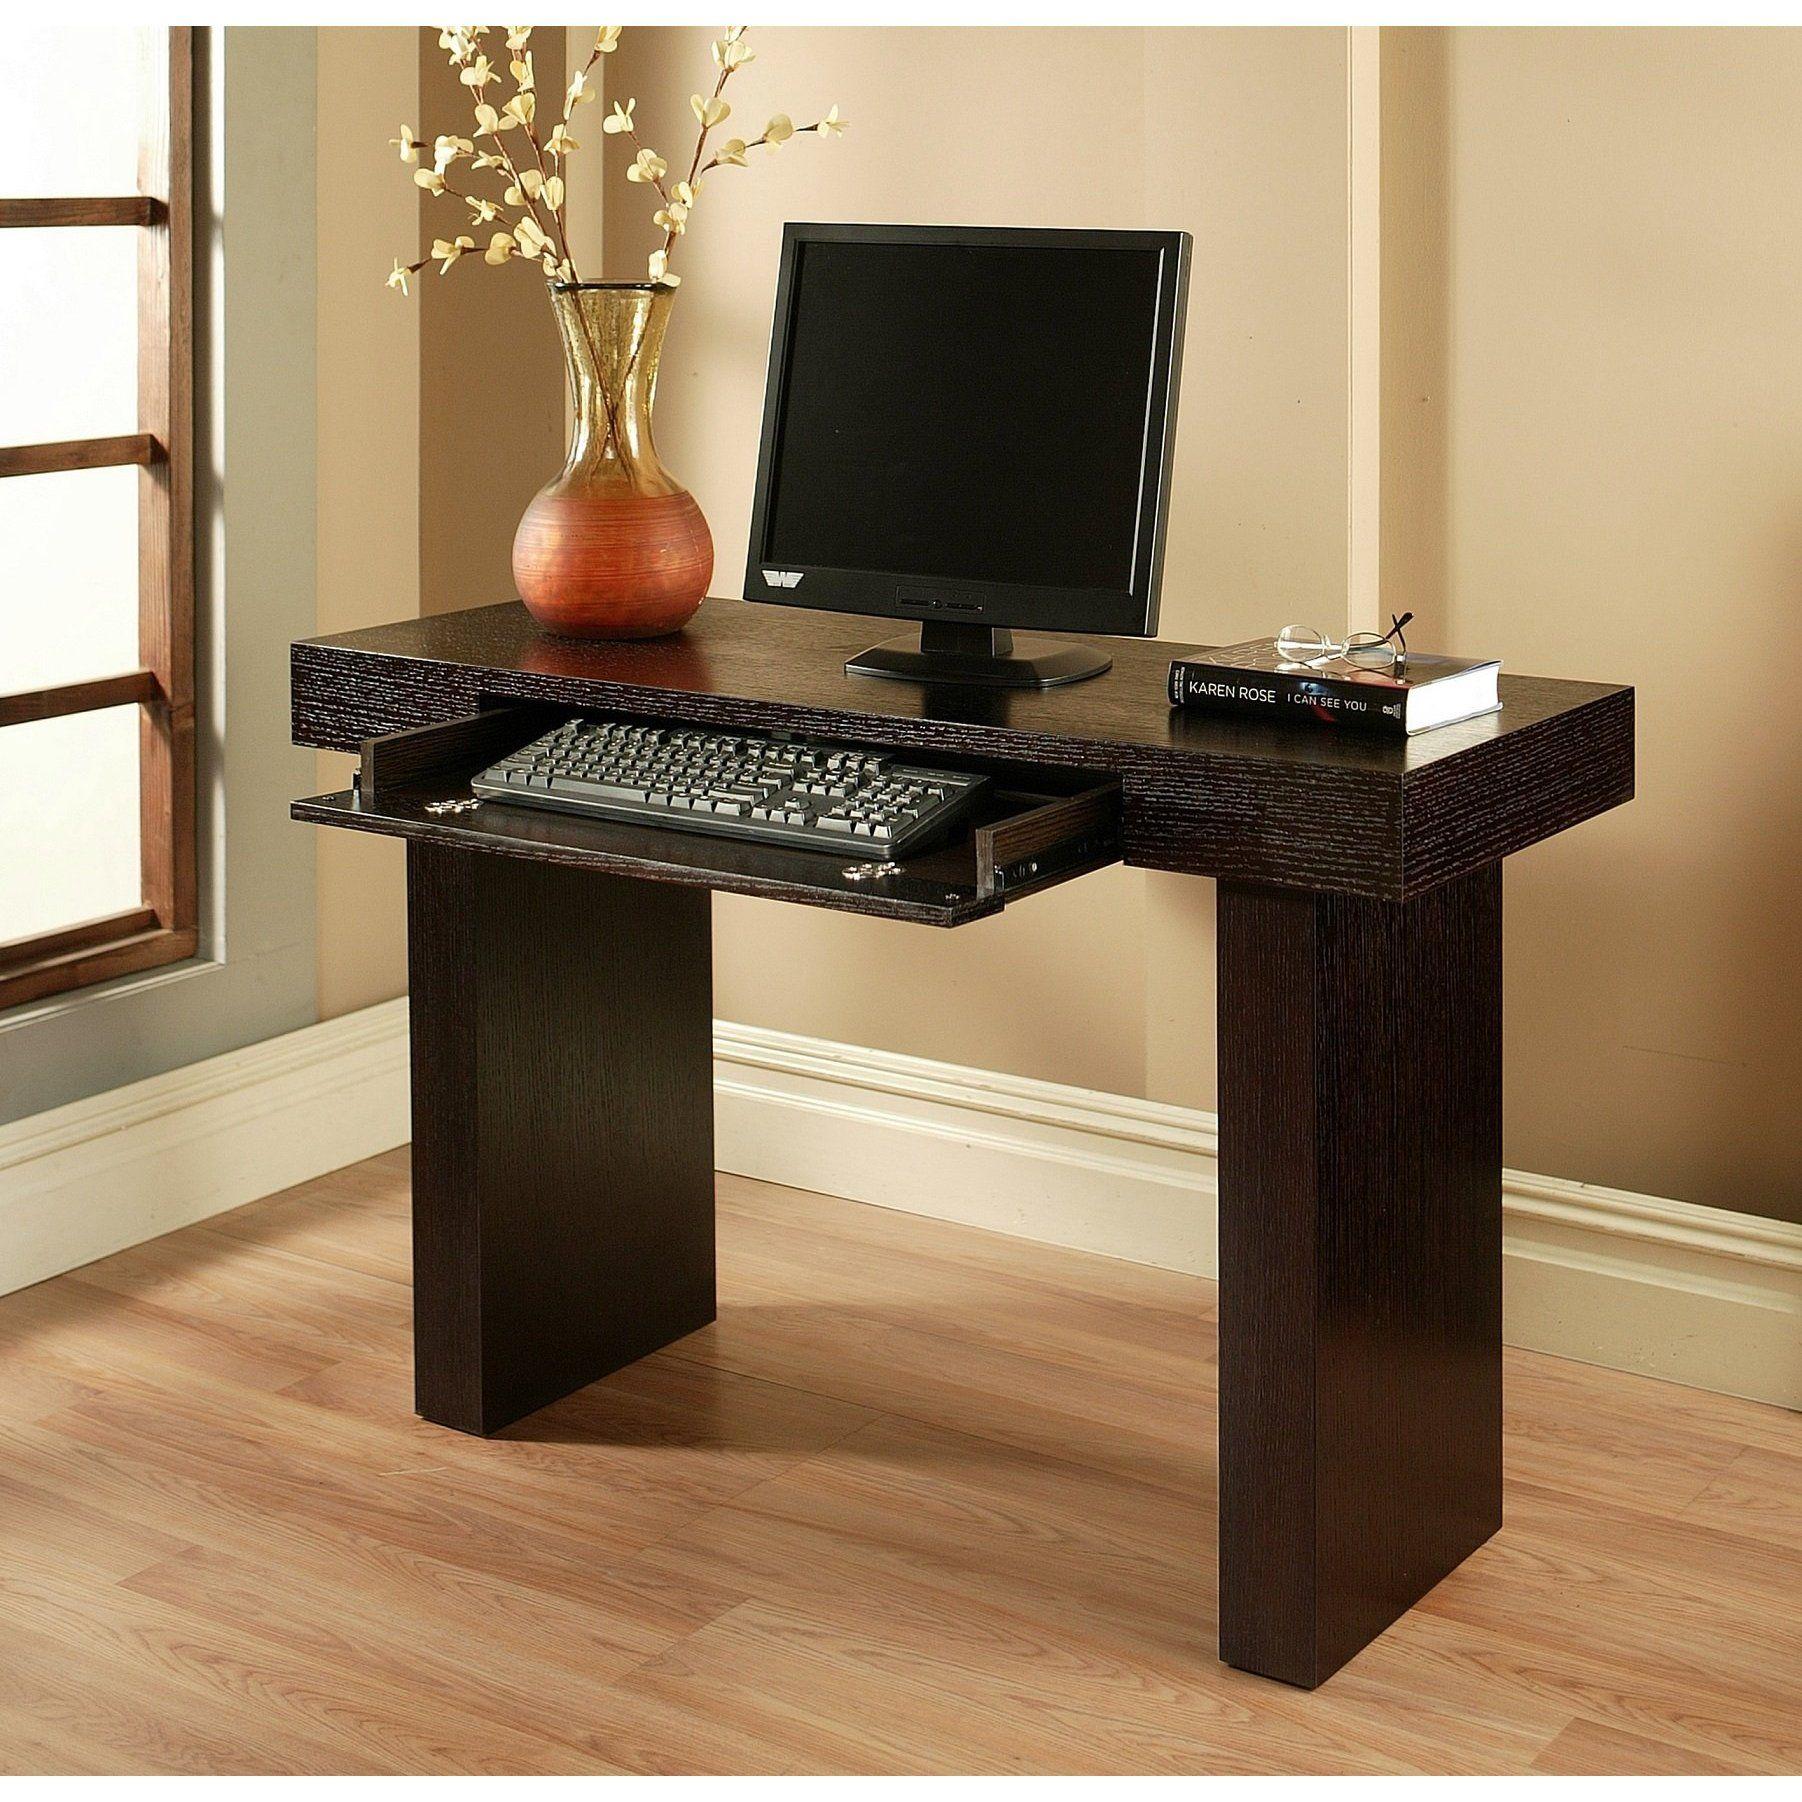 Monroe Espresso Solid Hardwood Computer Desk W Panel Leg Solid Hardwood Espresso Finish Computer Desk Computer Desk Design Diy Computer Desk Computer Desk